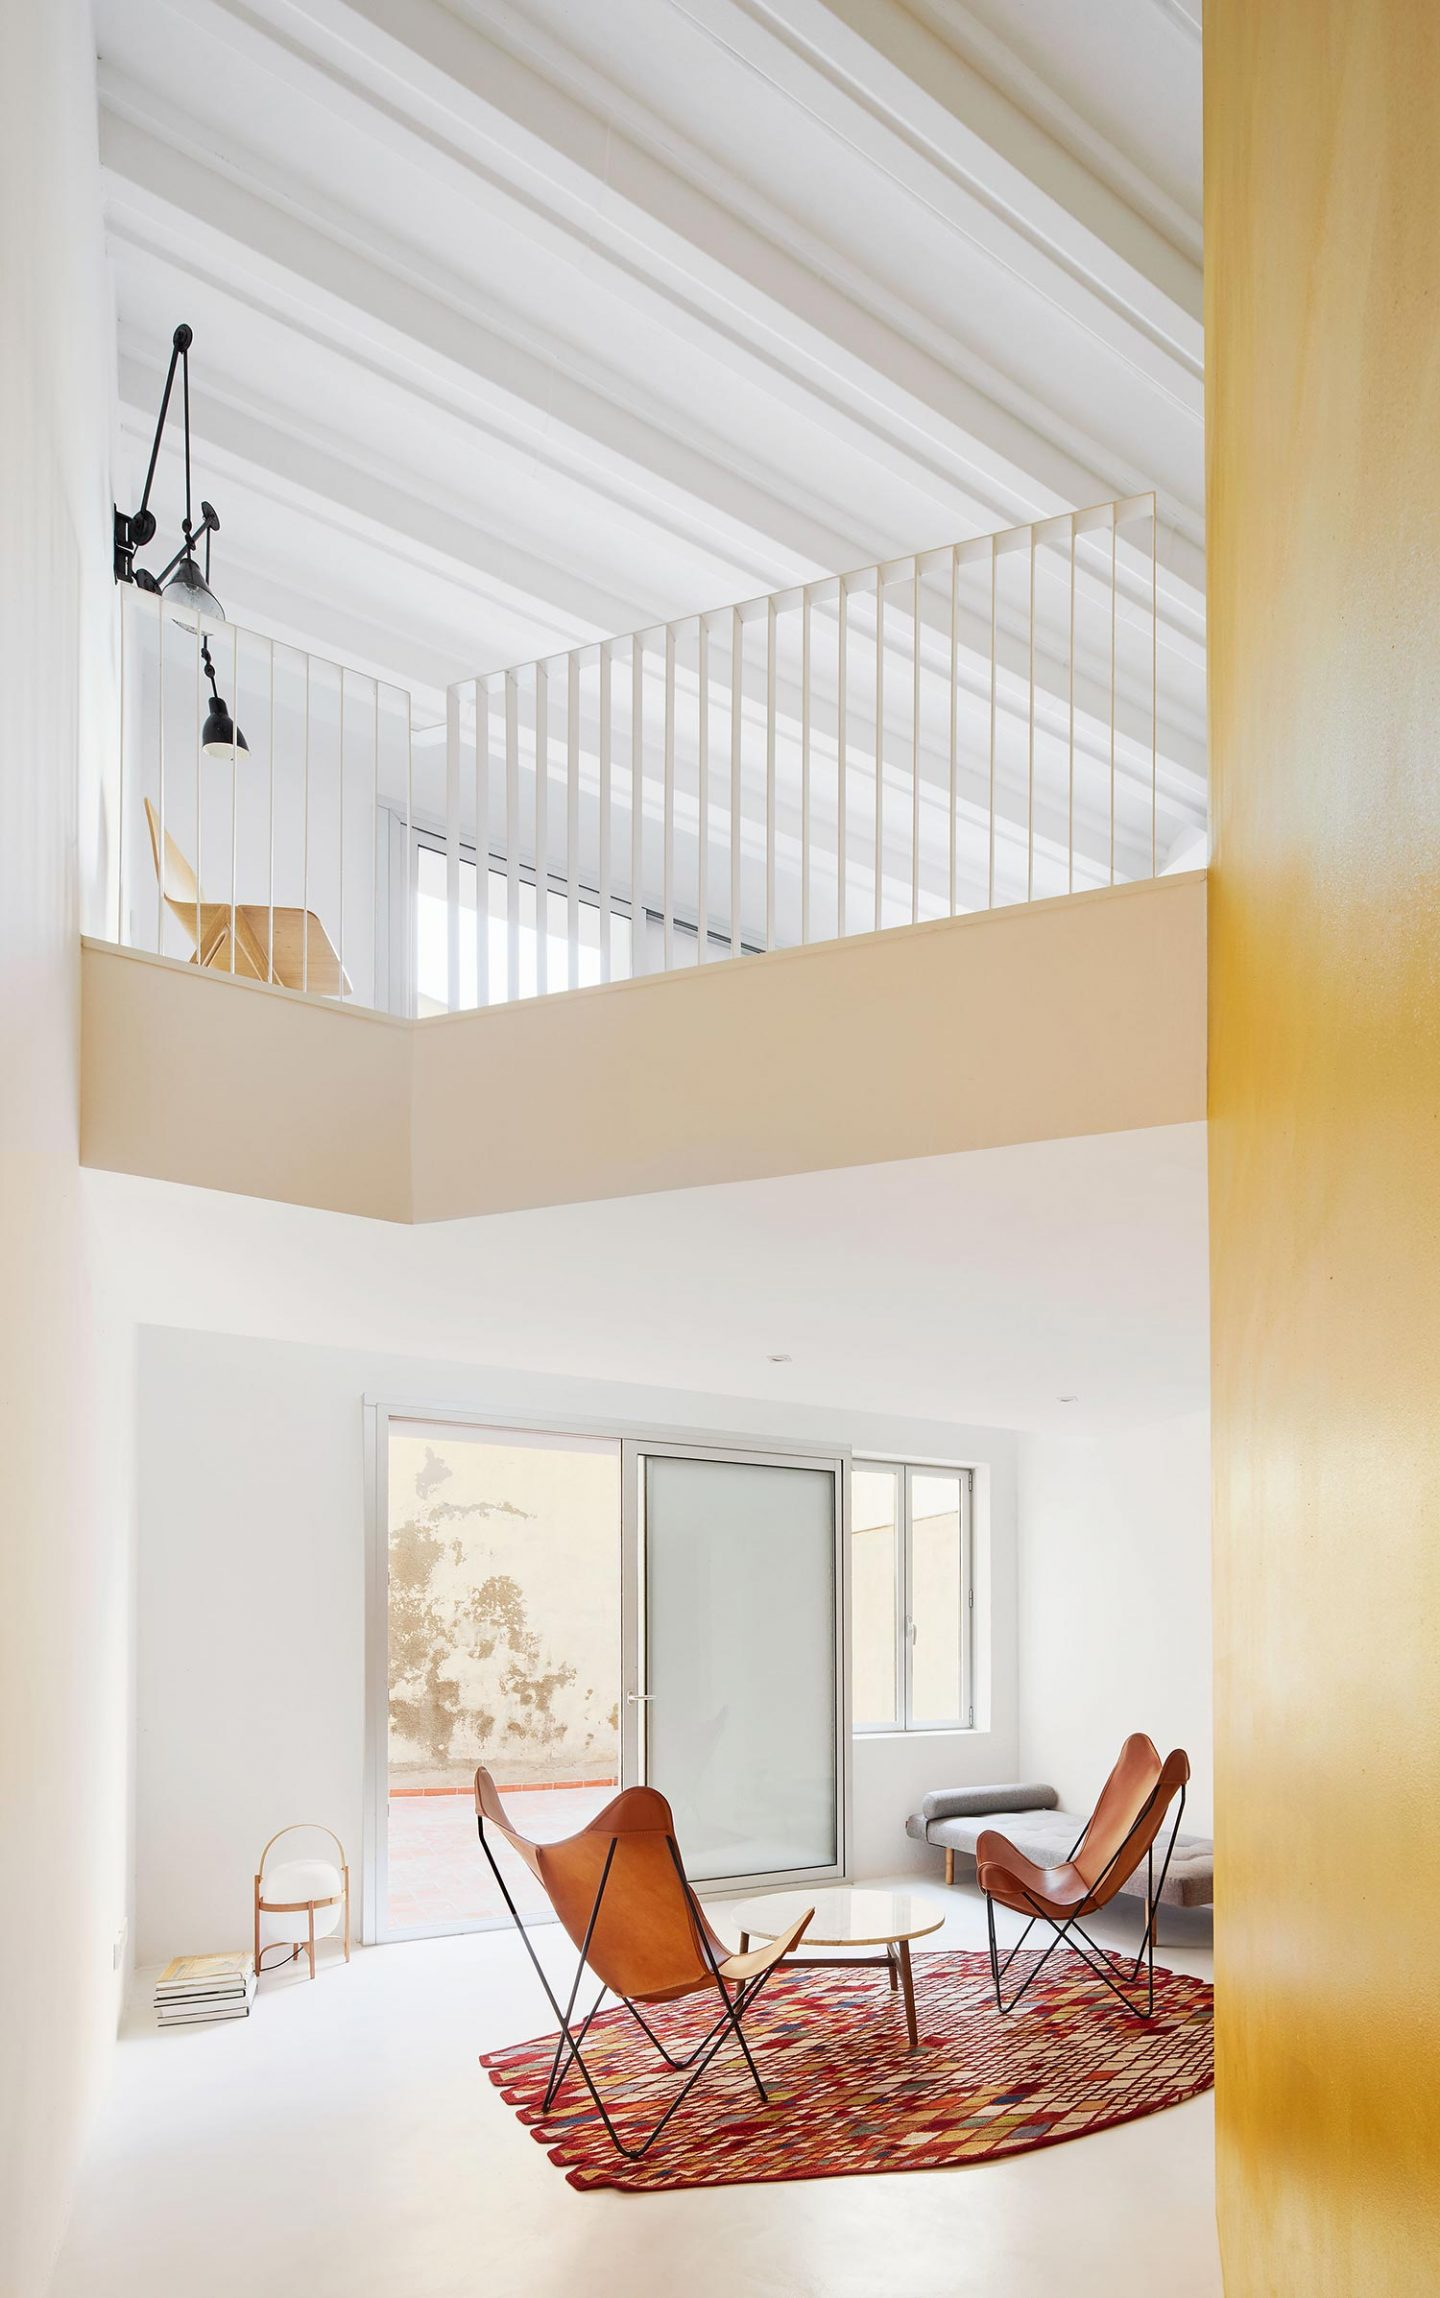 iGNANT_Architecture_Duplex_Tibbaut_Raul_Sanchez_10